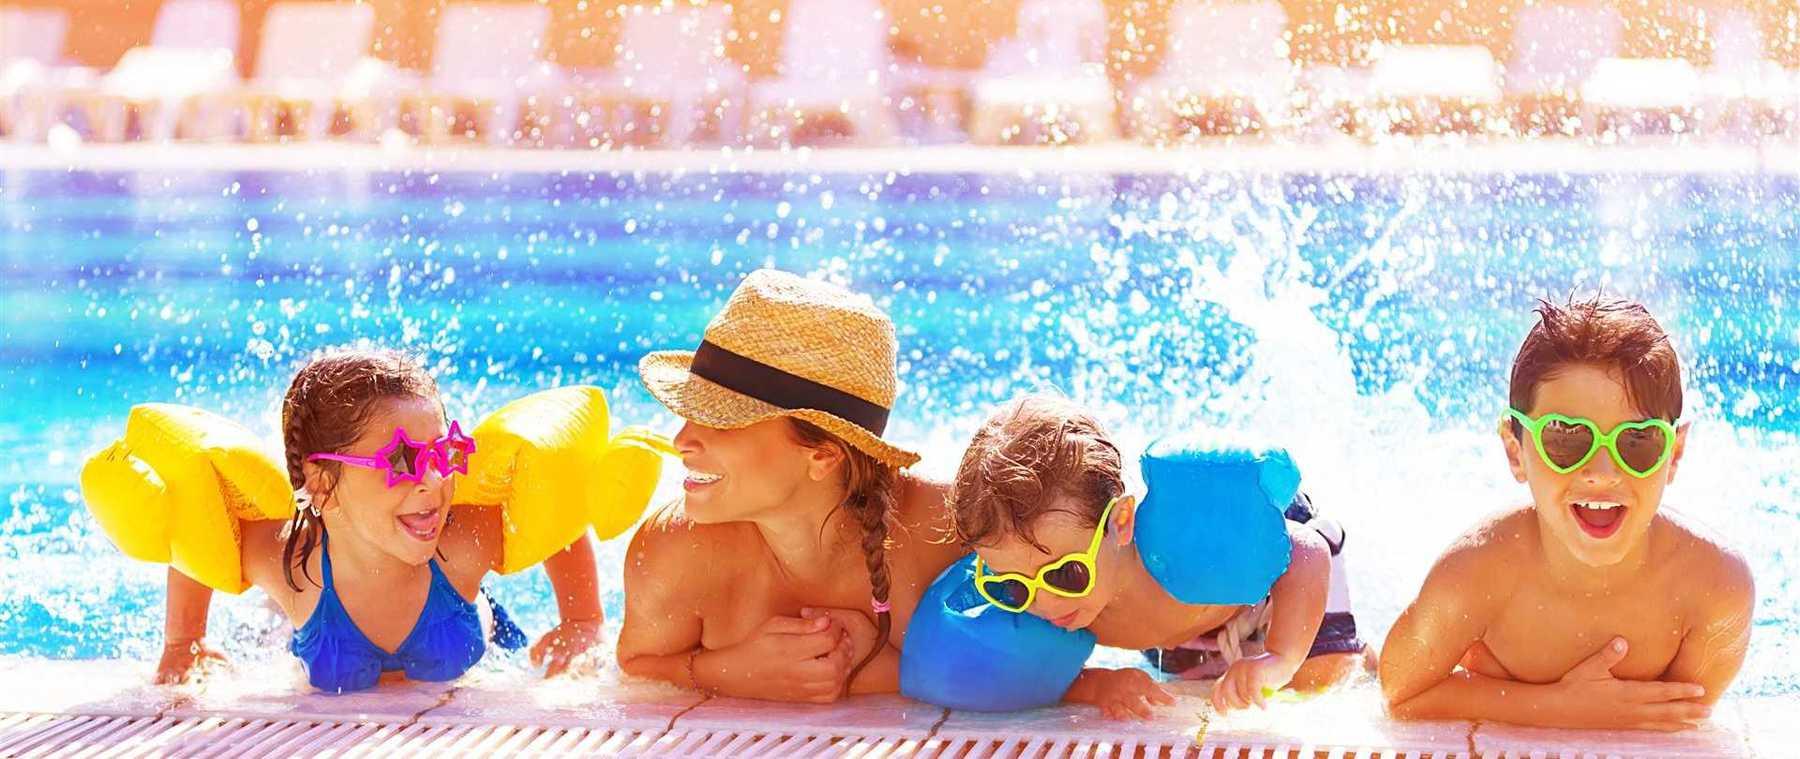 Happy-family-in-pool.jpeg